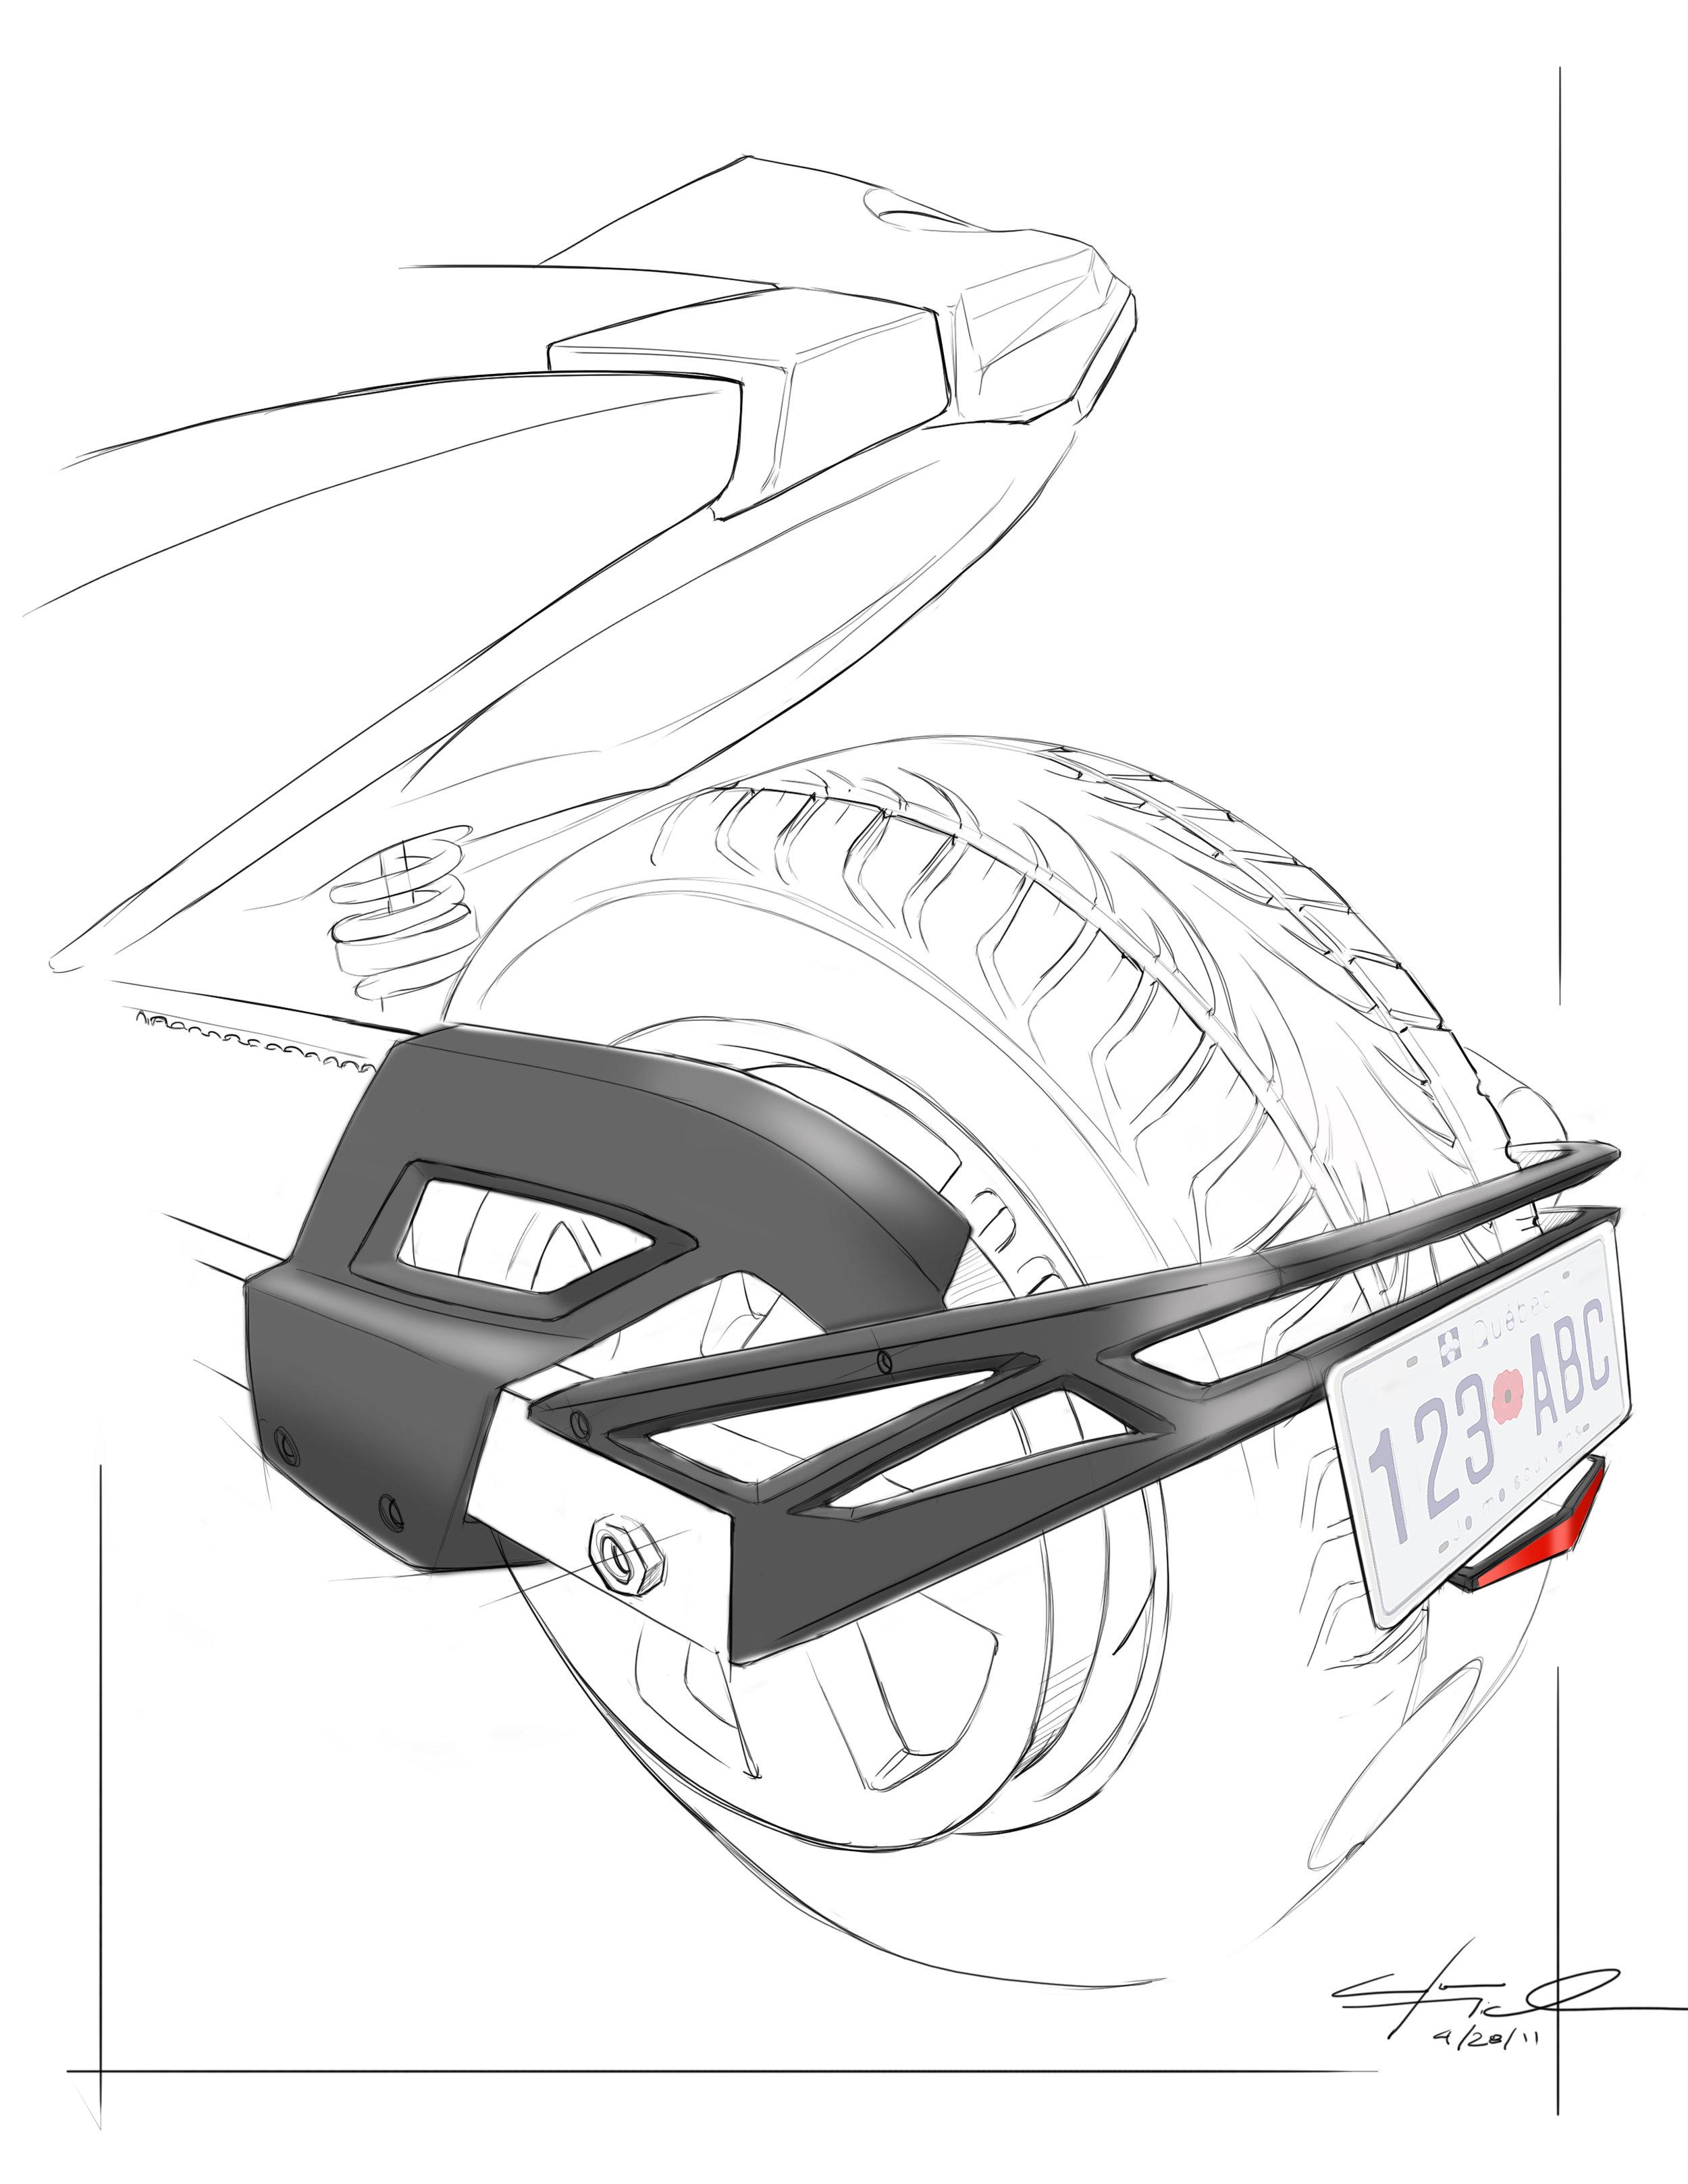 Rear Fender sketches 04282011_B1.jpg